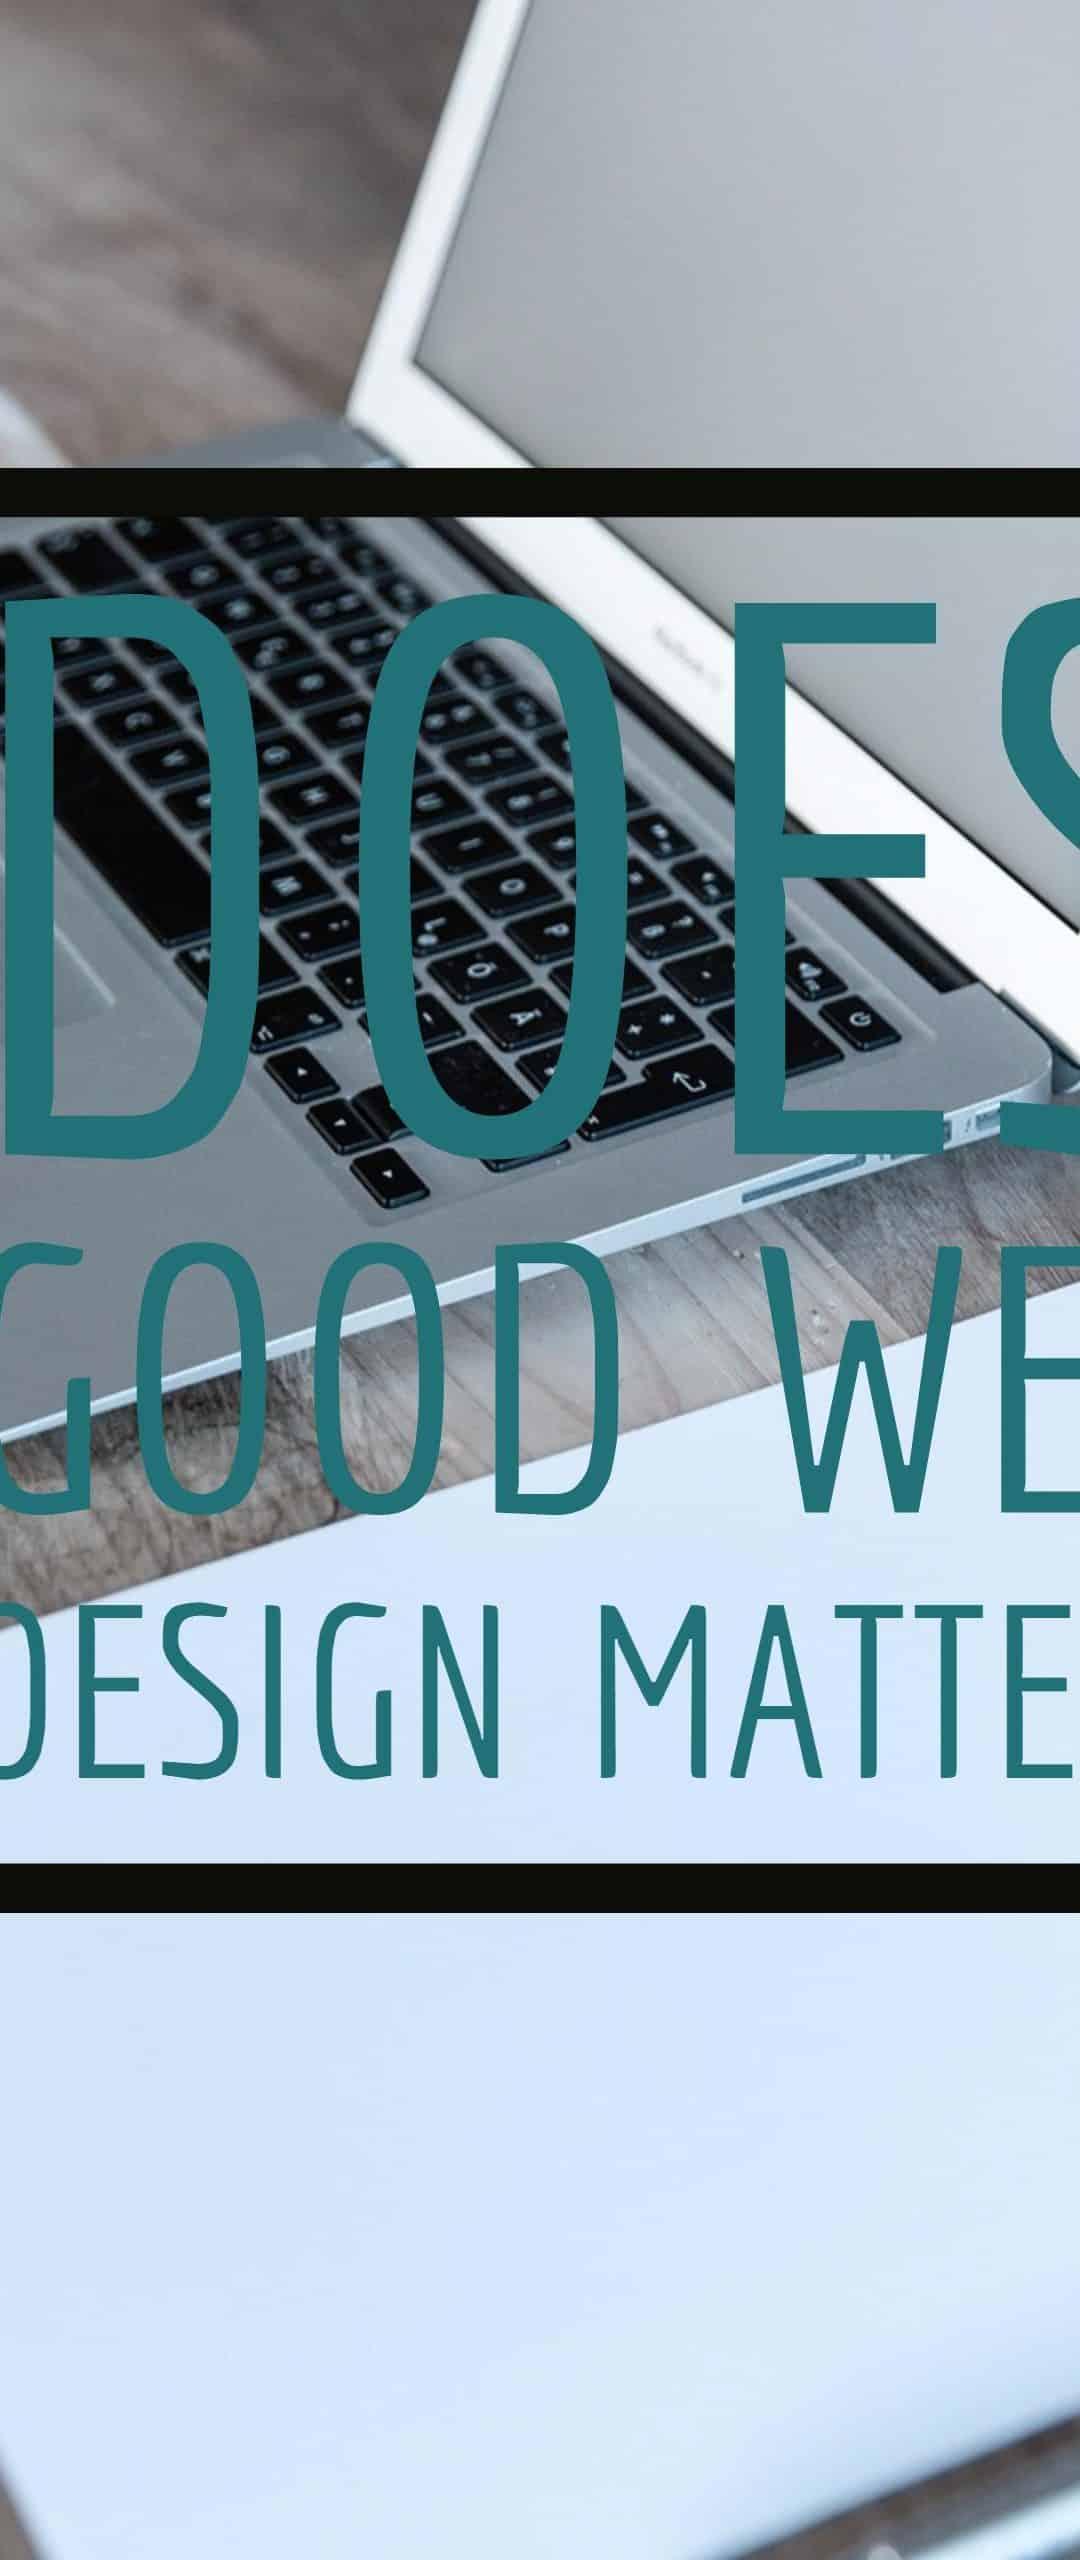 Does Good Web Design Matter?